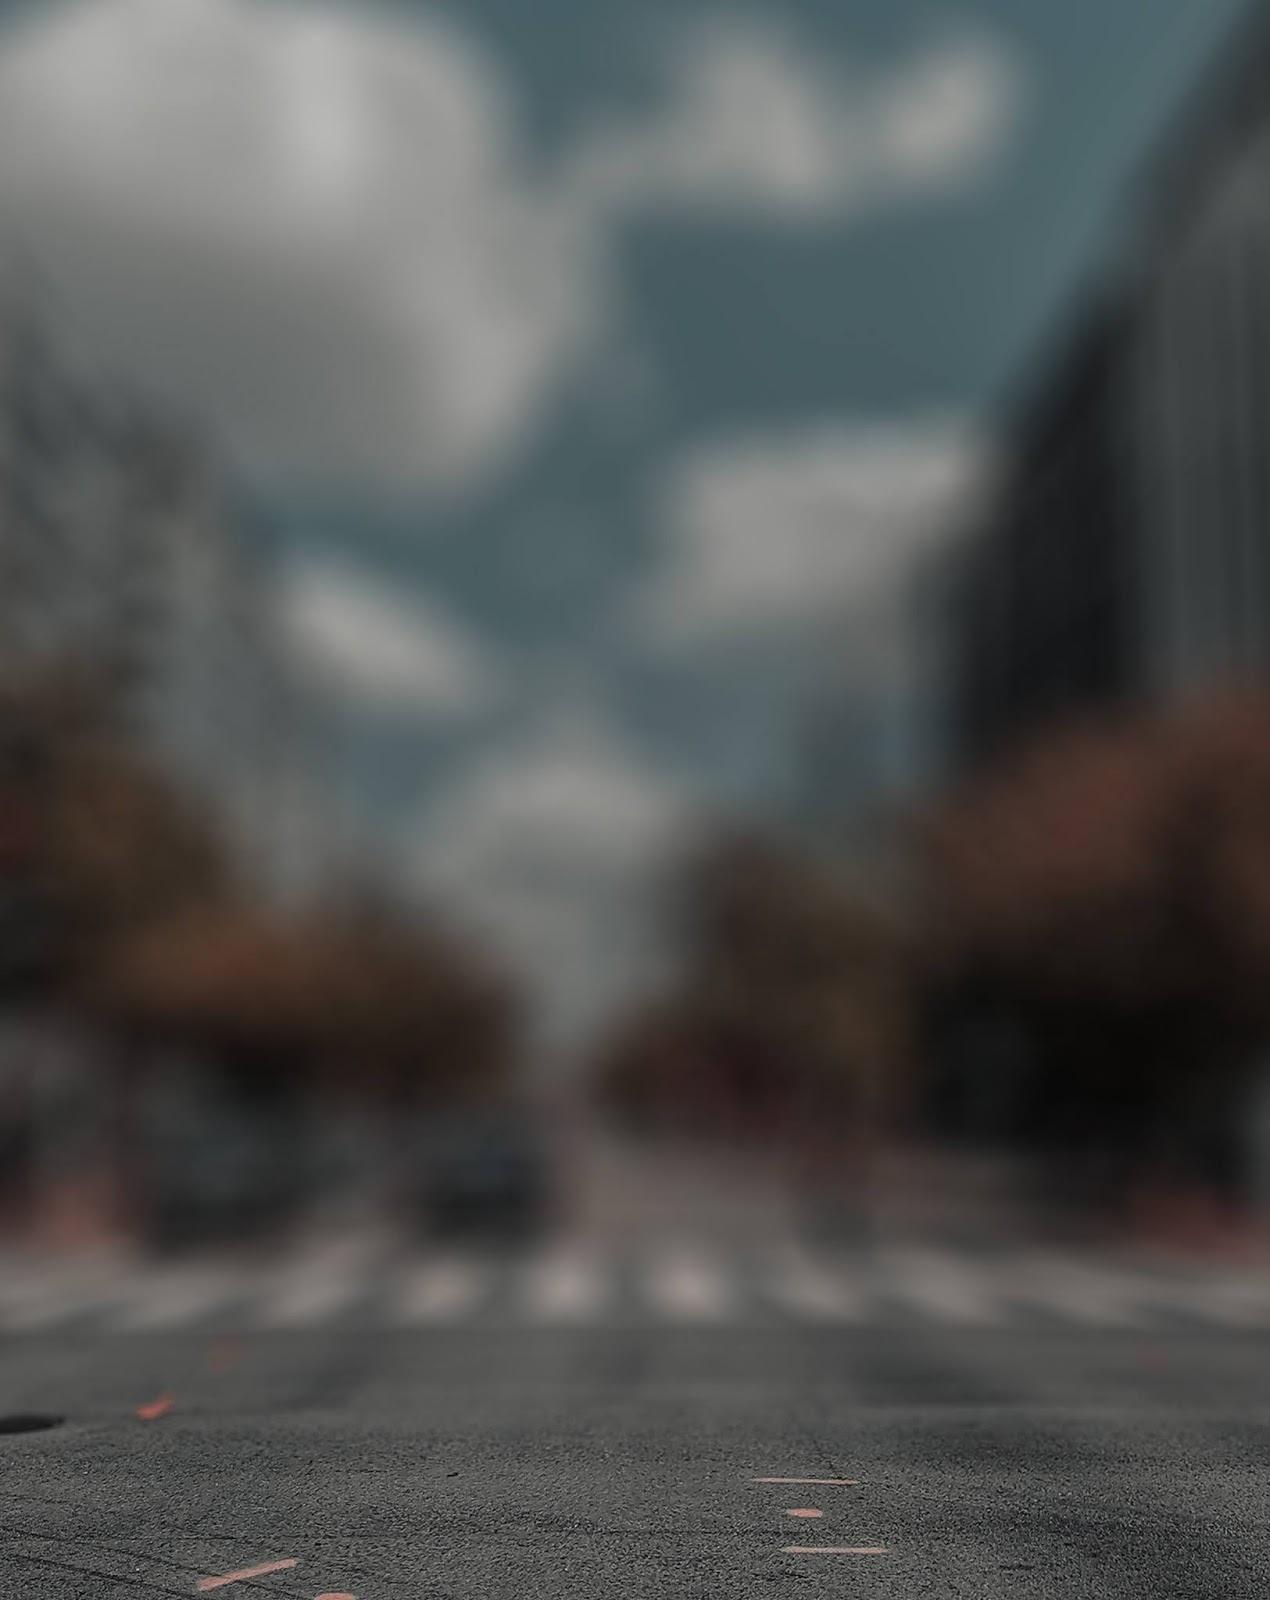 Dark Cb Road Blur Background Stock Free Image Download